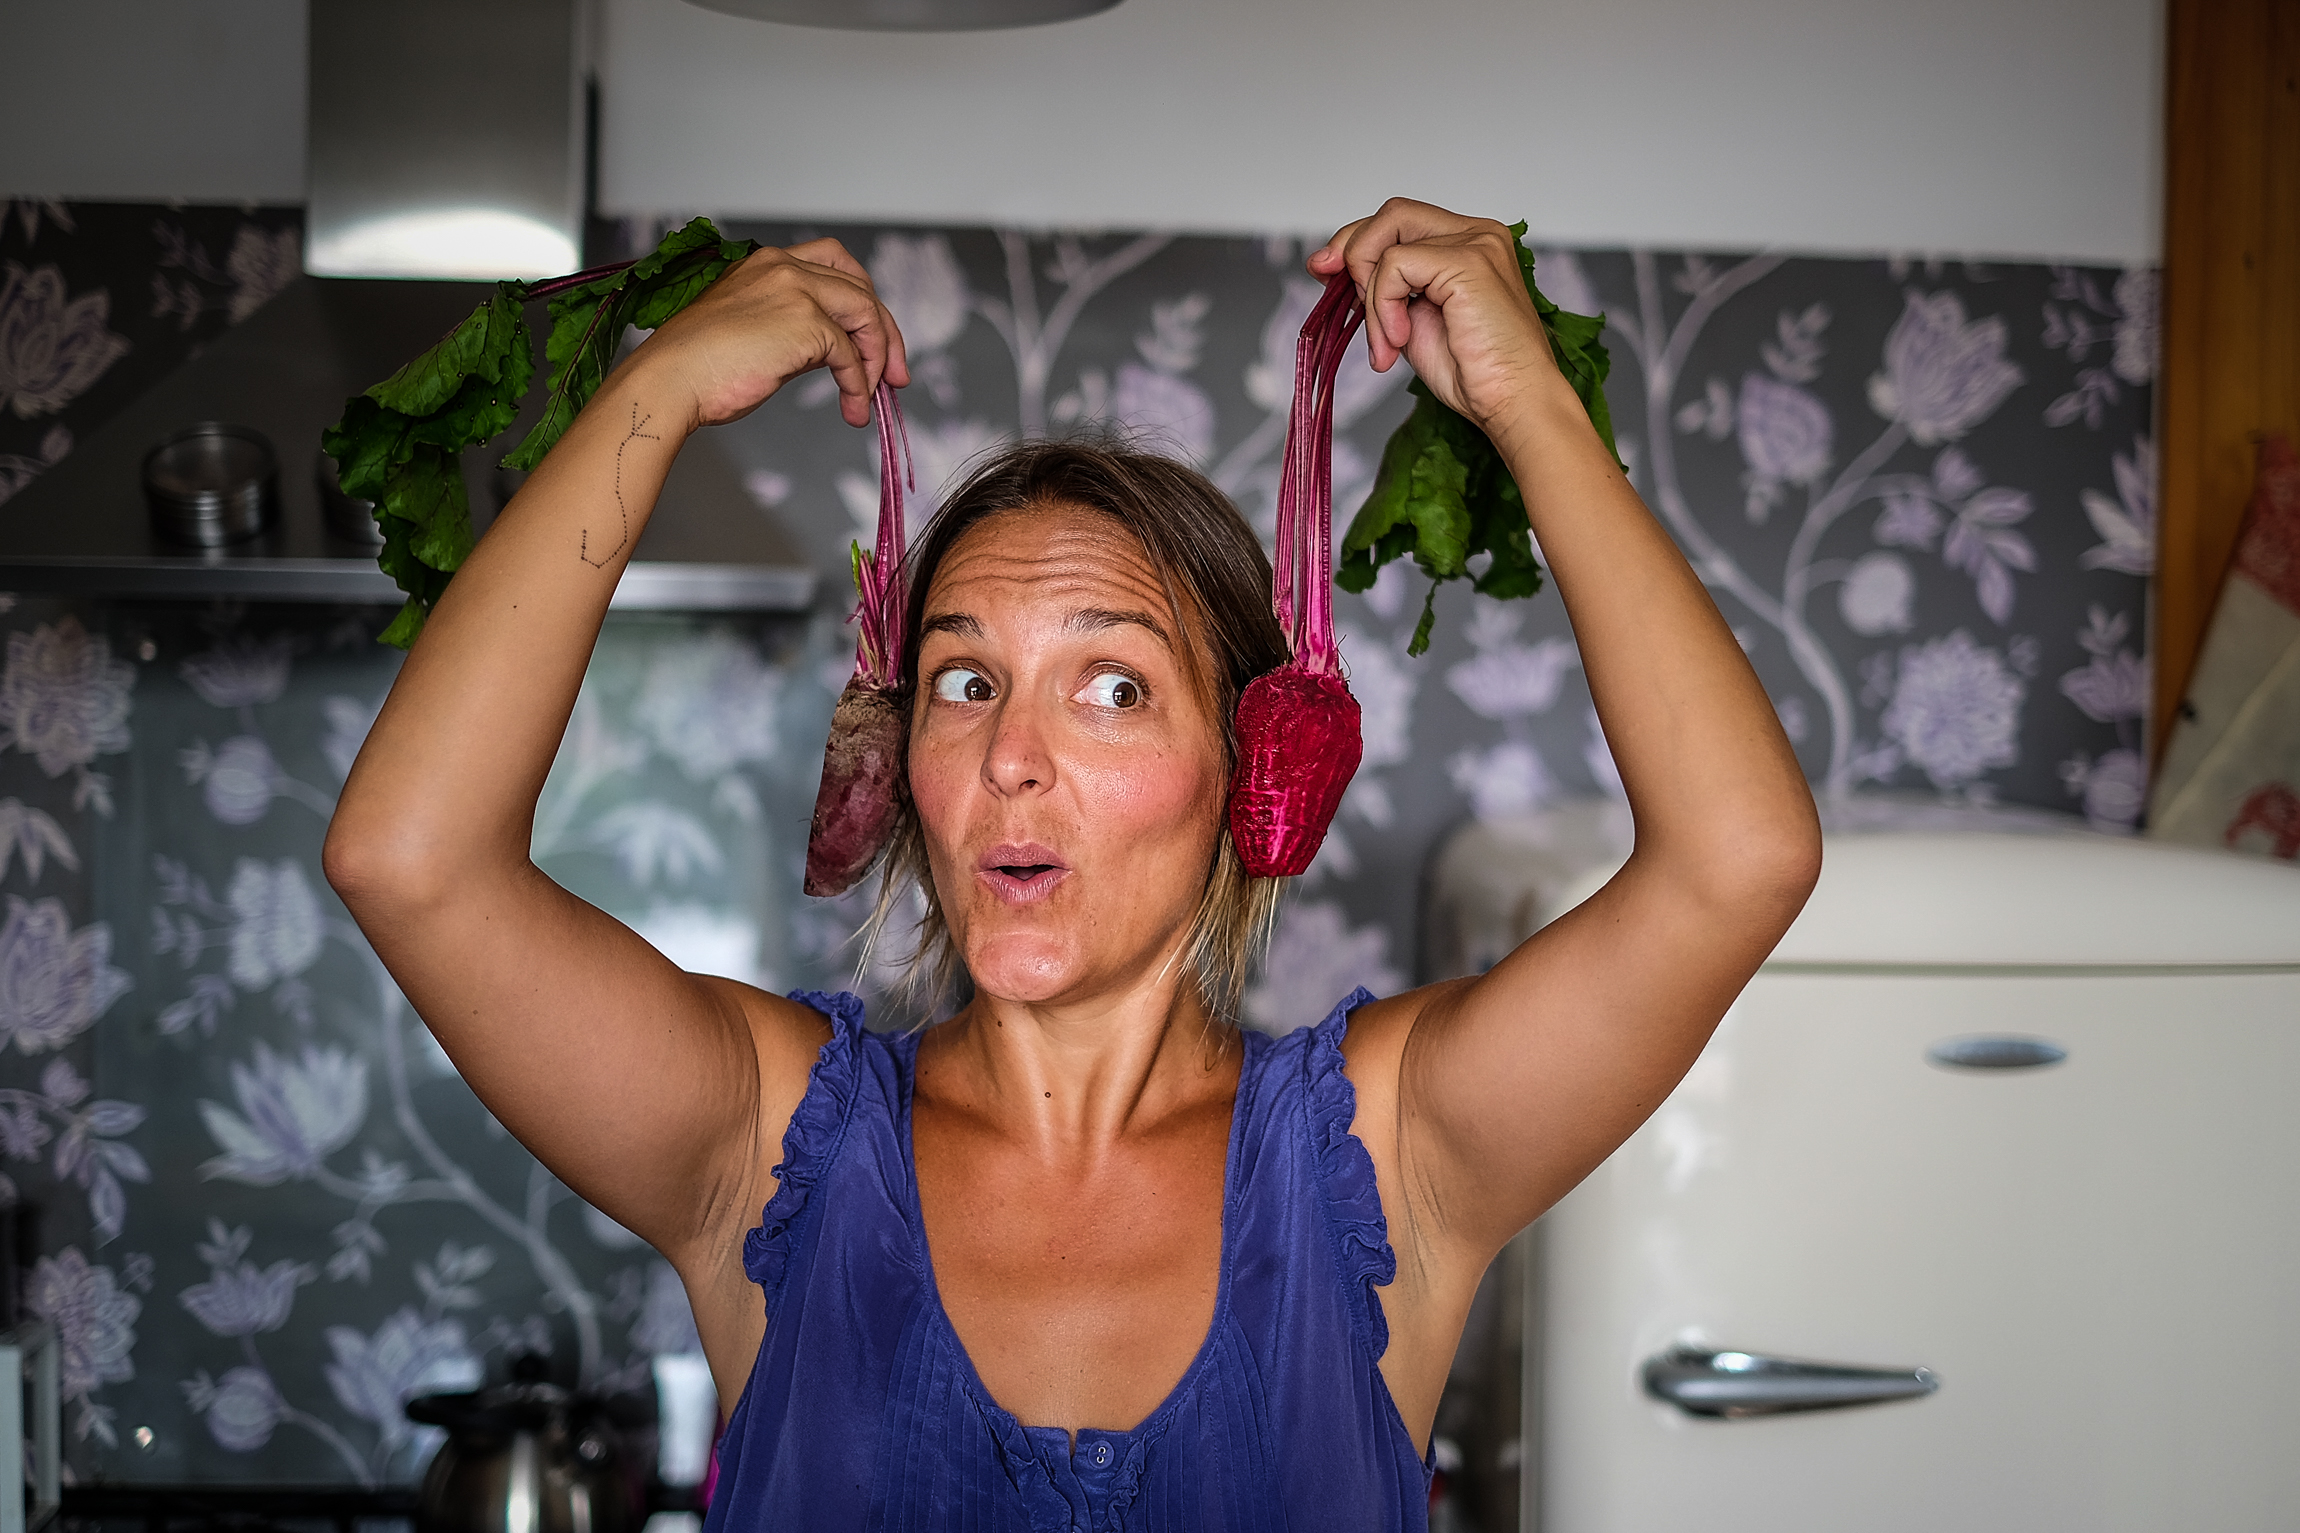 Na radionicama osluškujemo što danas želimo (s)kuhati & (po)jesti? / Workshops are based on Feeling what We would Love to Cook & Eat Today?